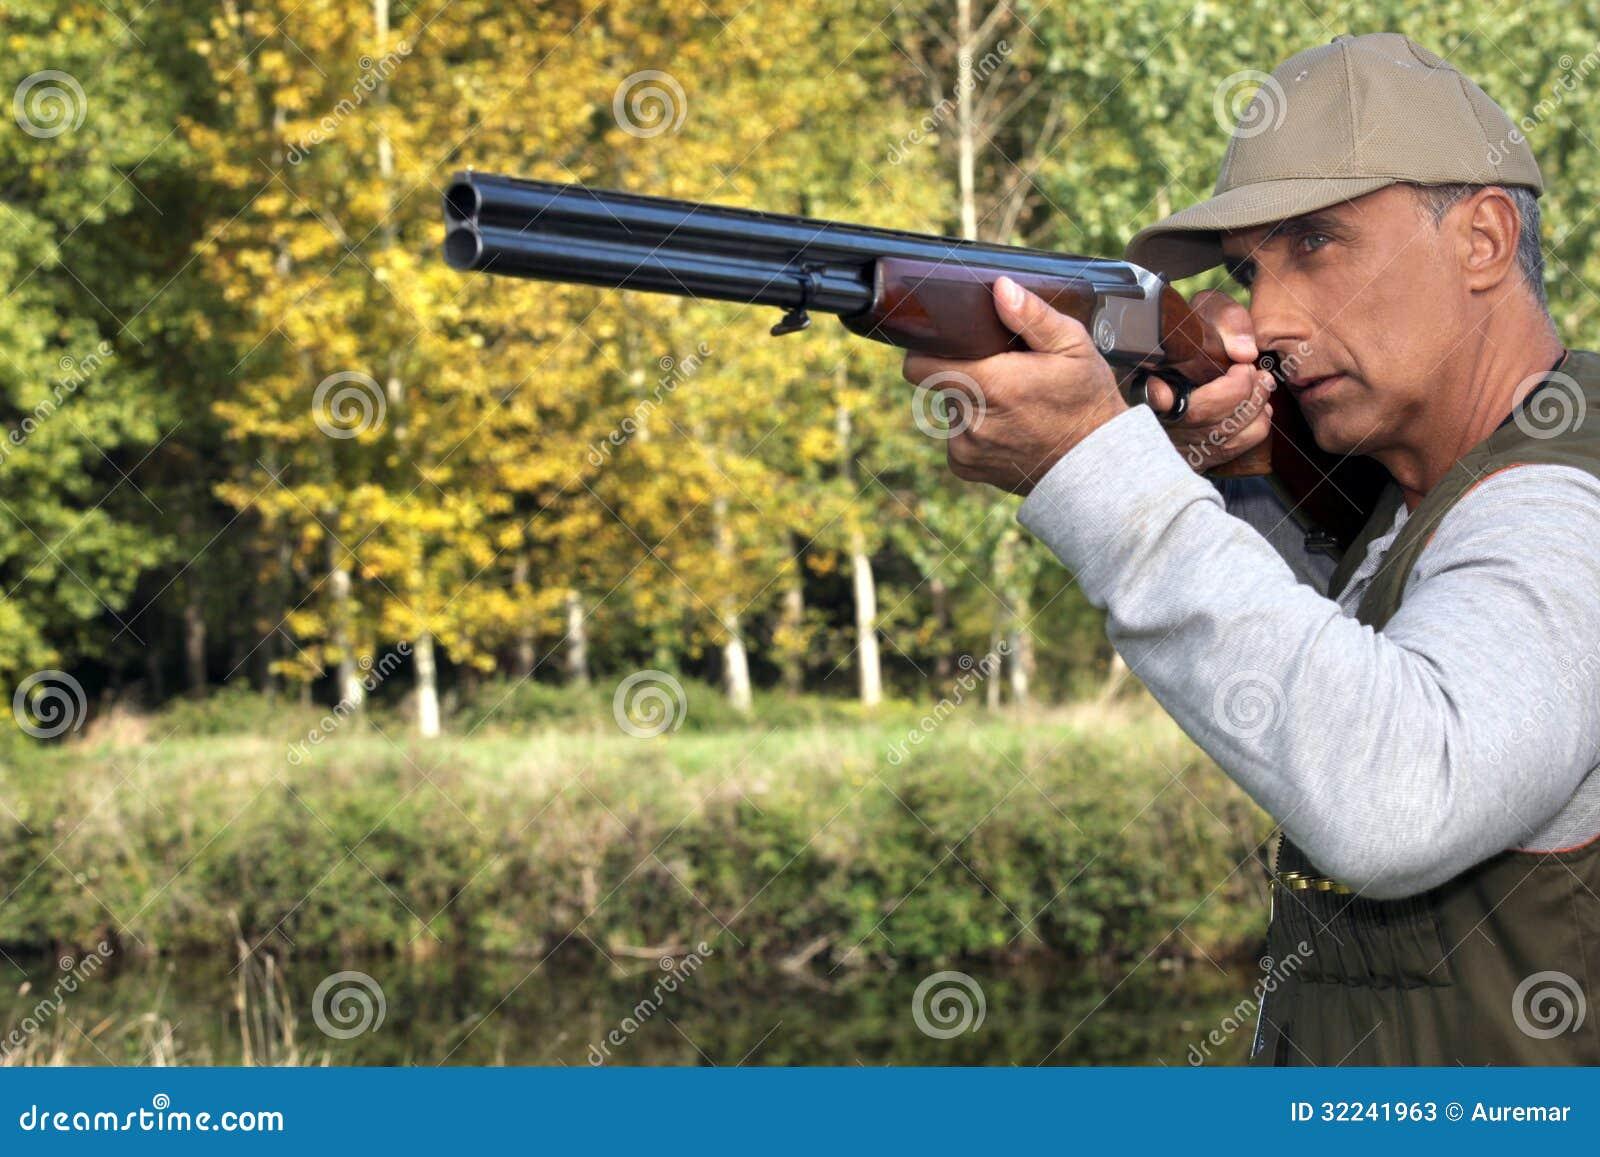 Hunter With A Gun Stock Photos - Image: 32241963